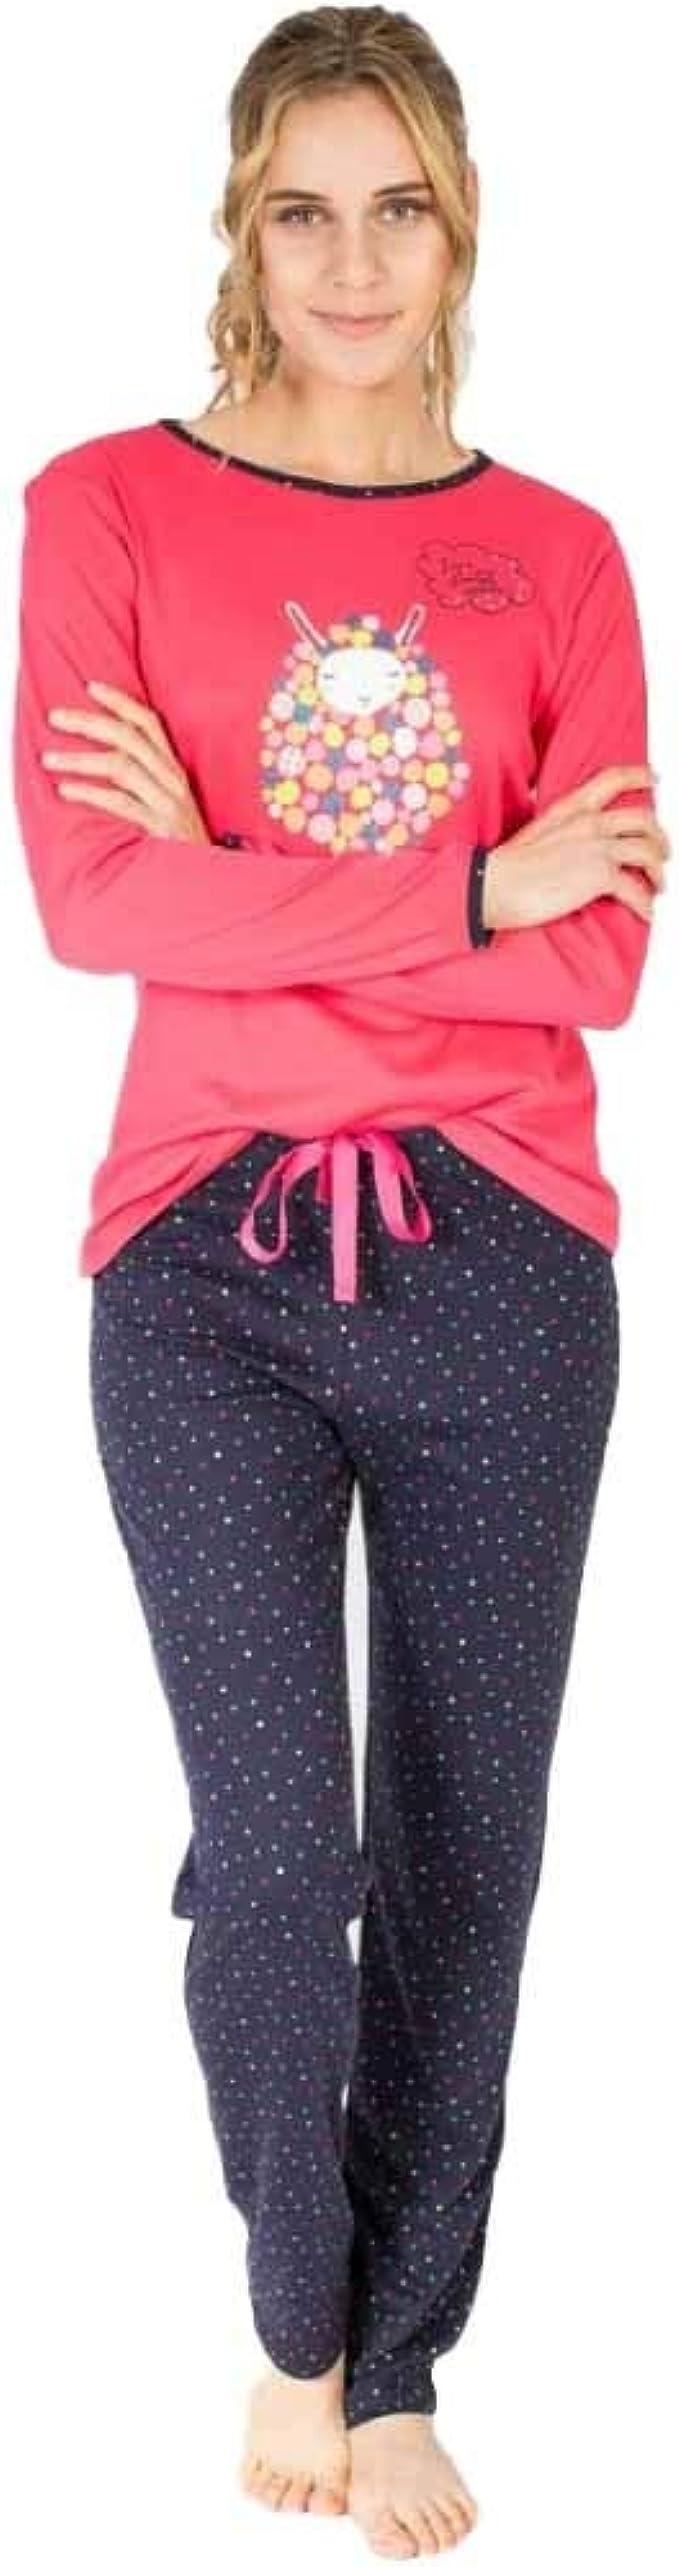 Massana Pijama de Mujer de algodón P681218